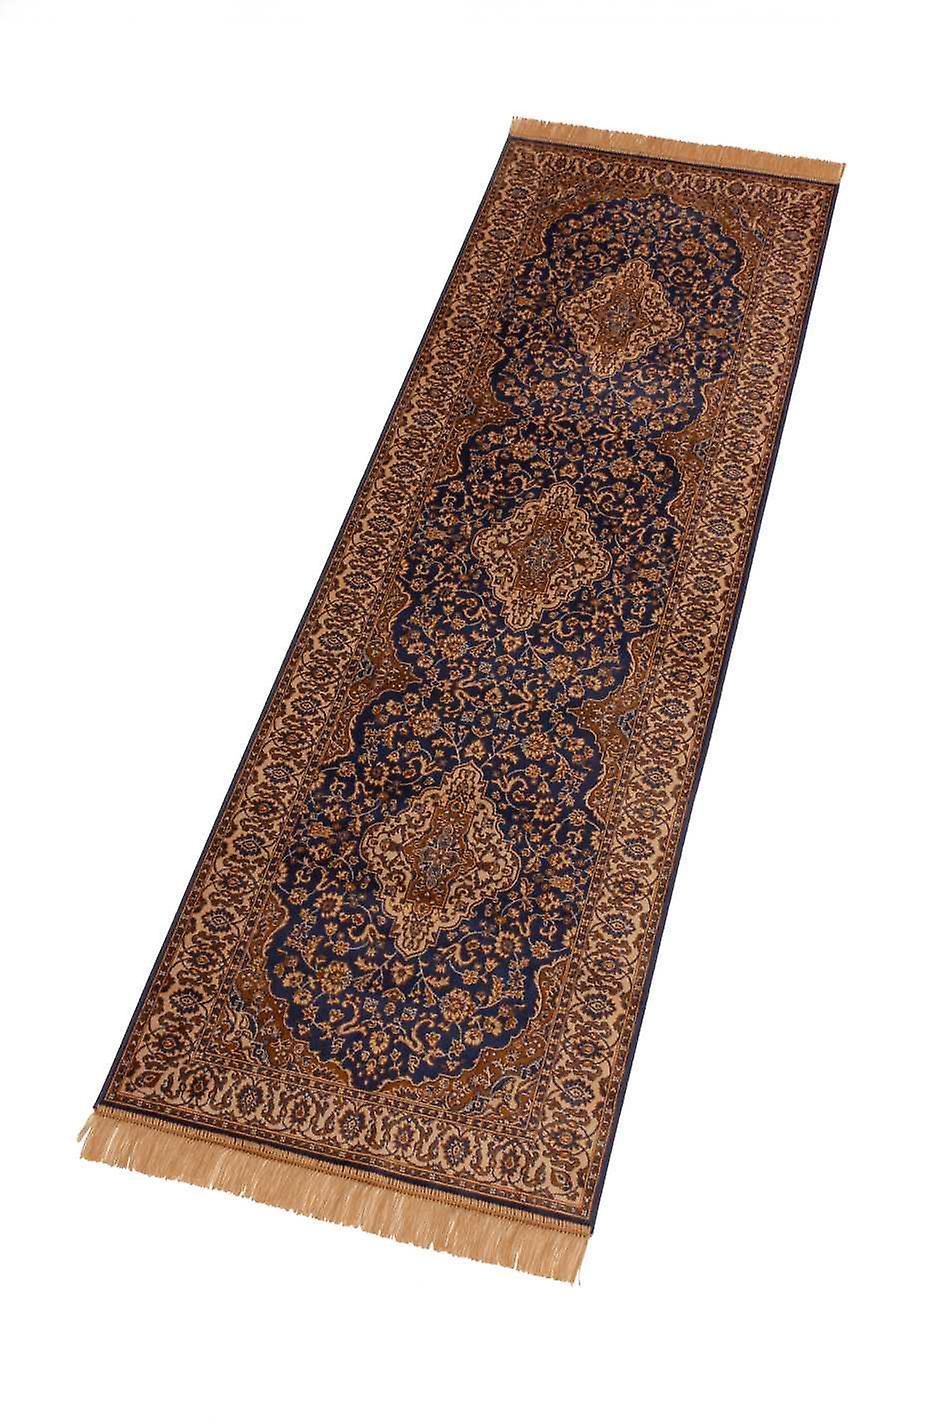 Blue Persian Medallion Artsilk Faux Silk Effect Hall Runner Rugs 9099/9